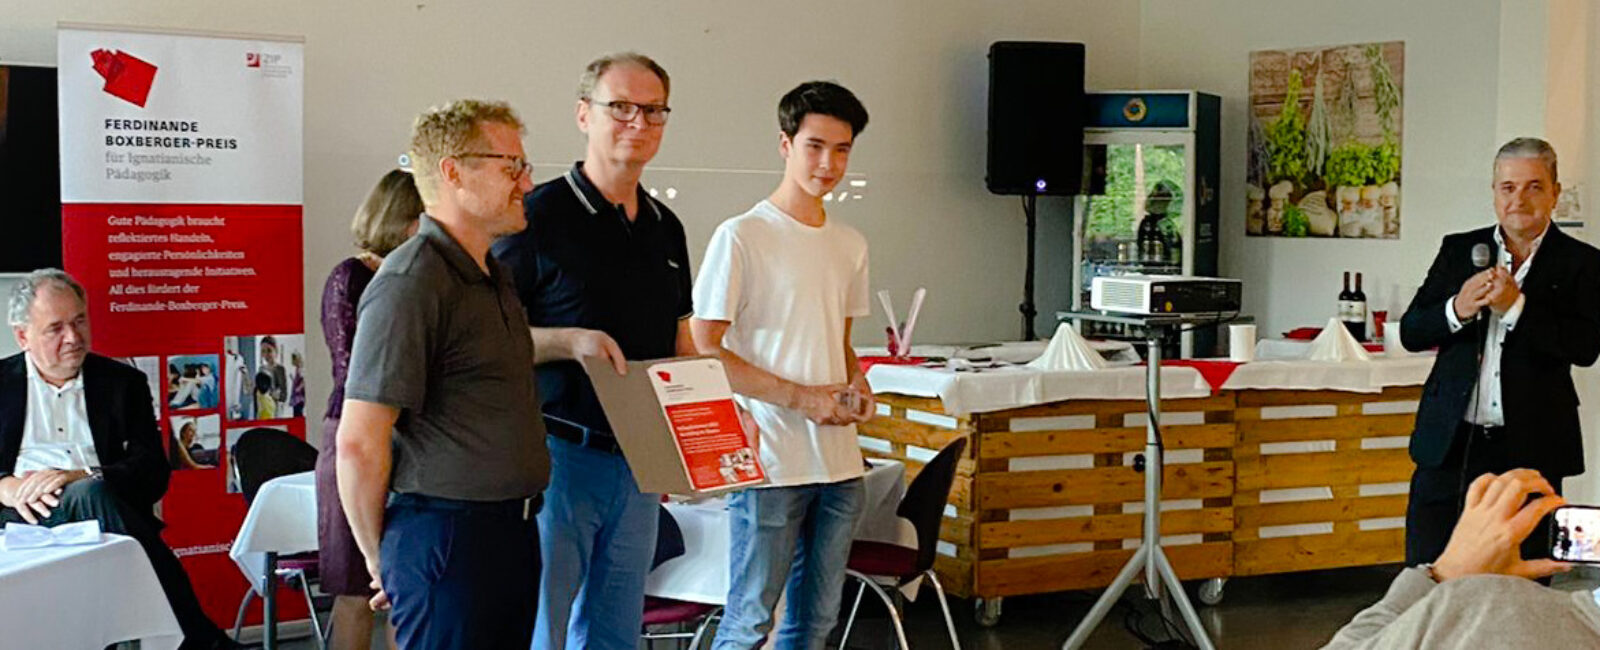 Boxberger-Preis ZIP